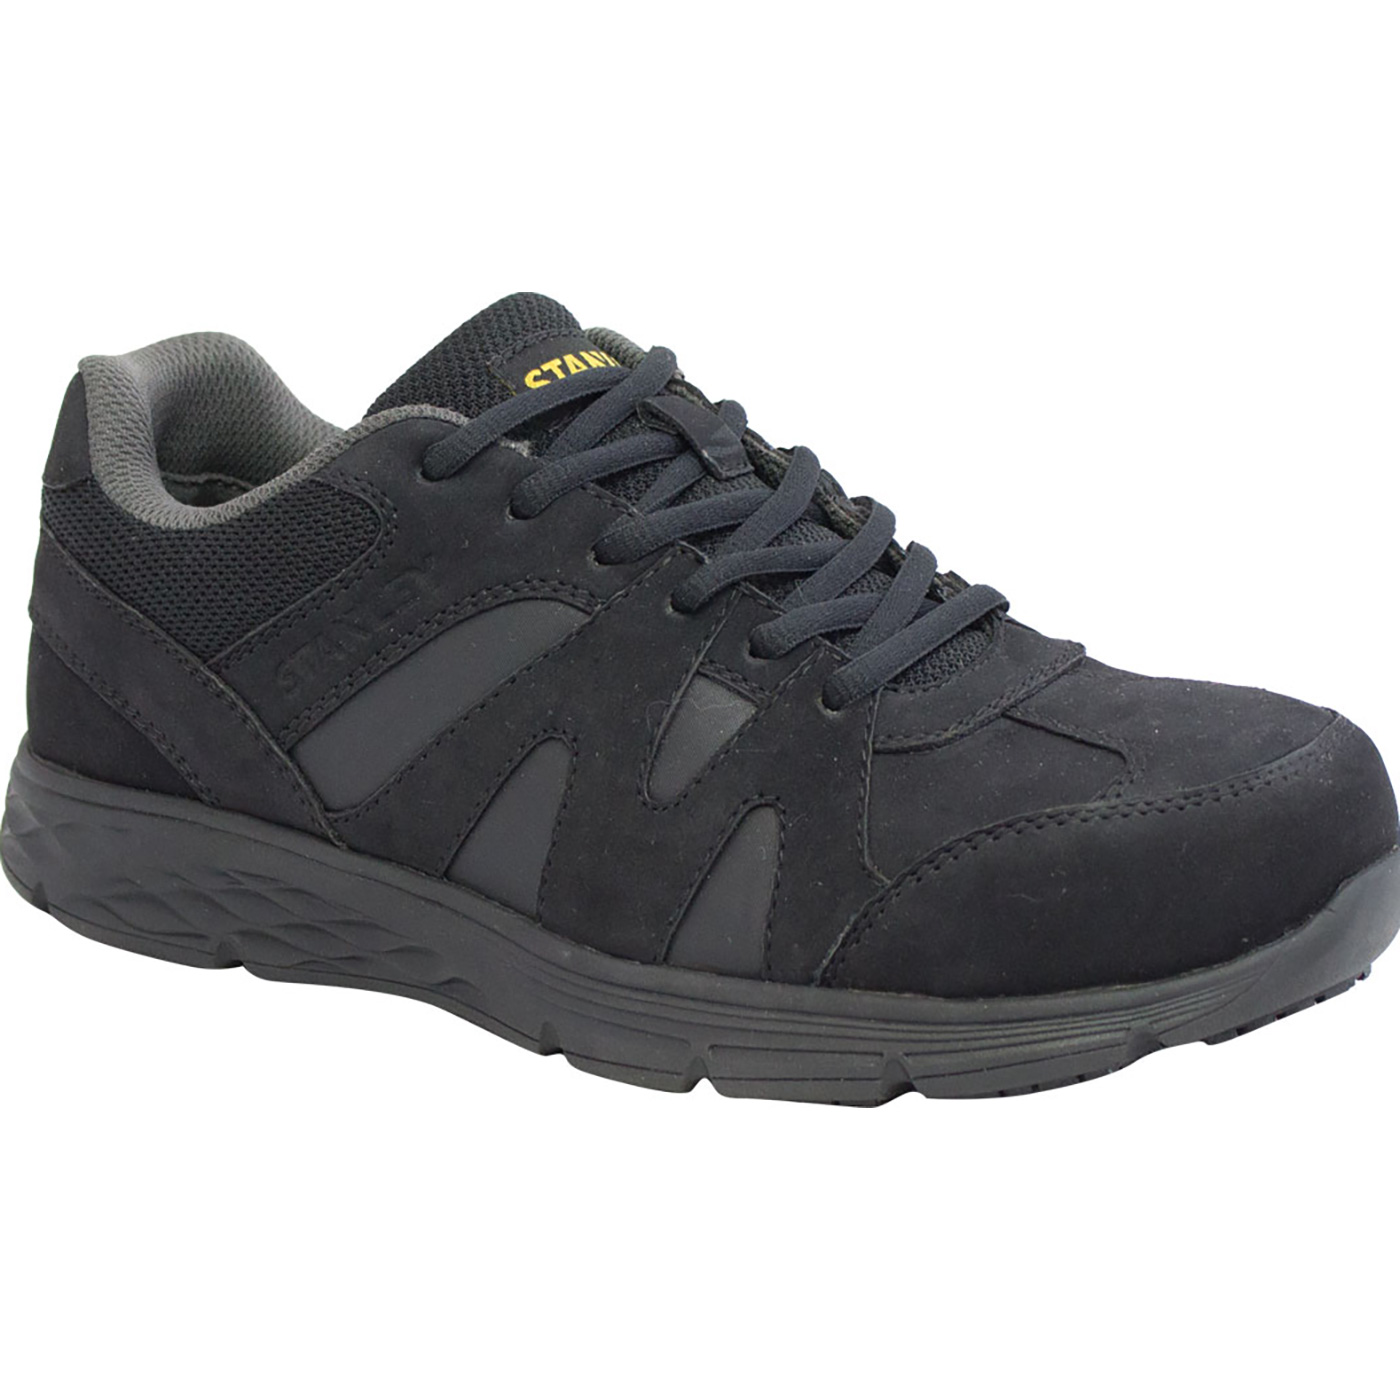 ae4cba02750b Stanley Stride Men s Slip Resistant Aluminum Toe Electrical Hazard Athletic  Work Shoes